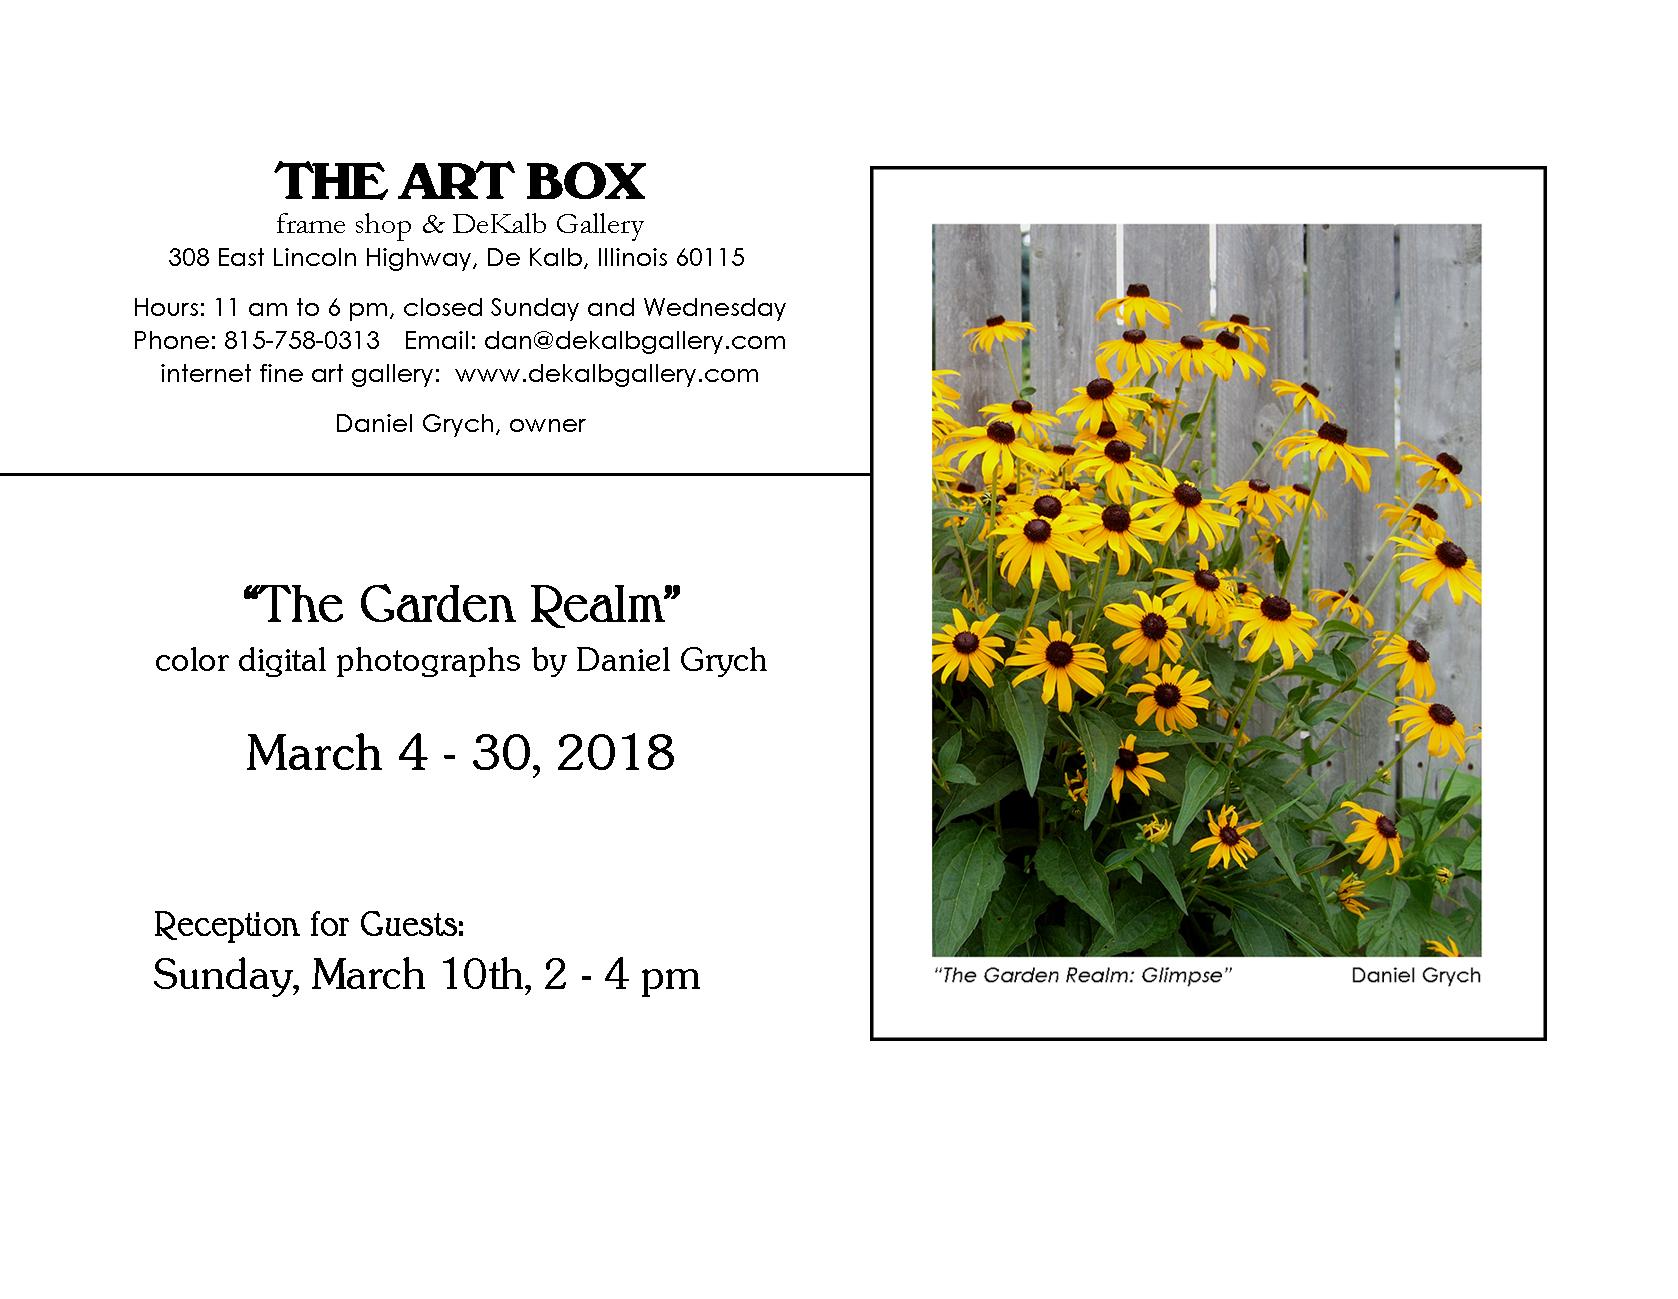 postcard-back-garden-realm_edited-1